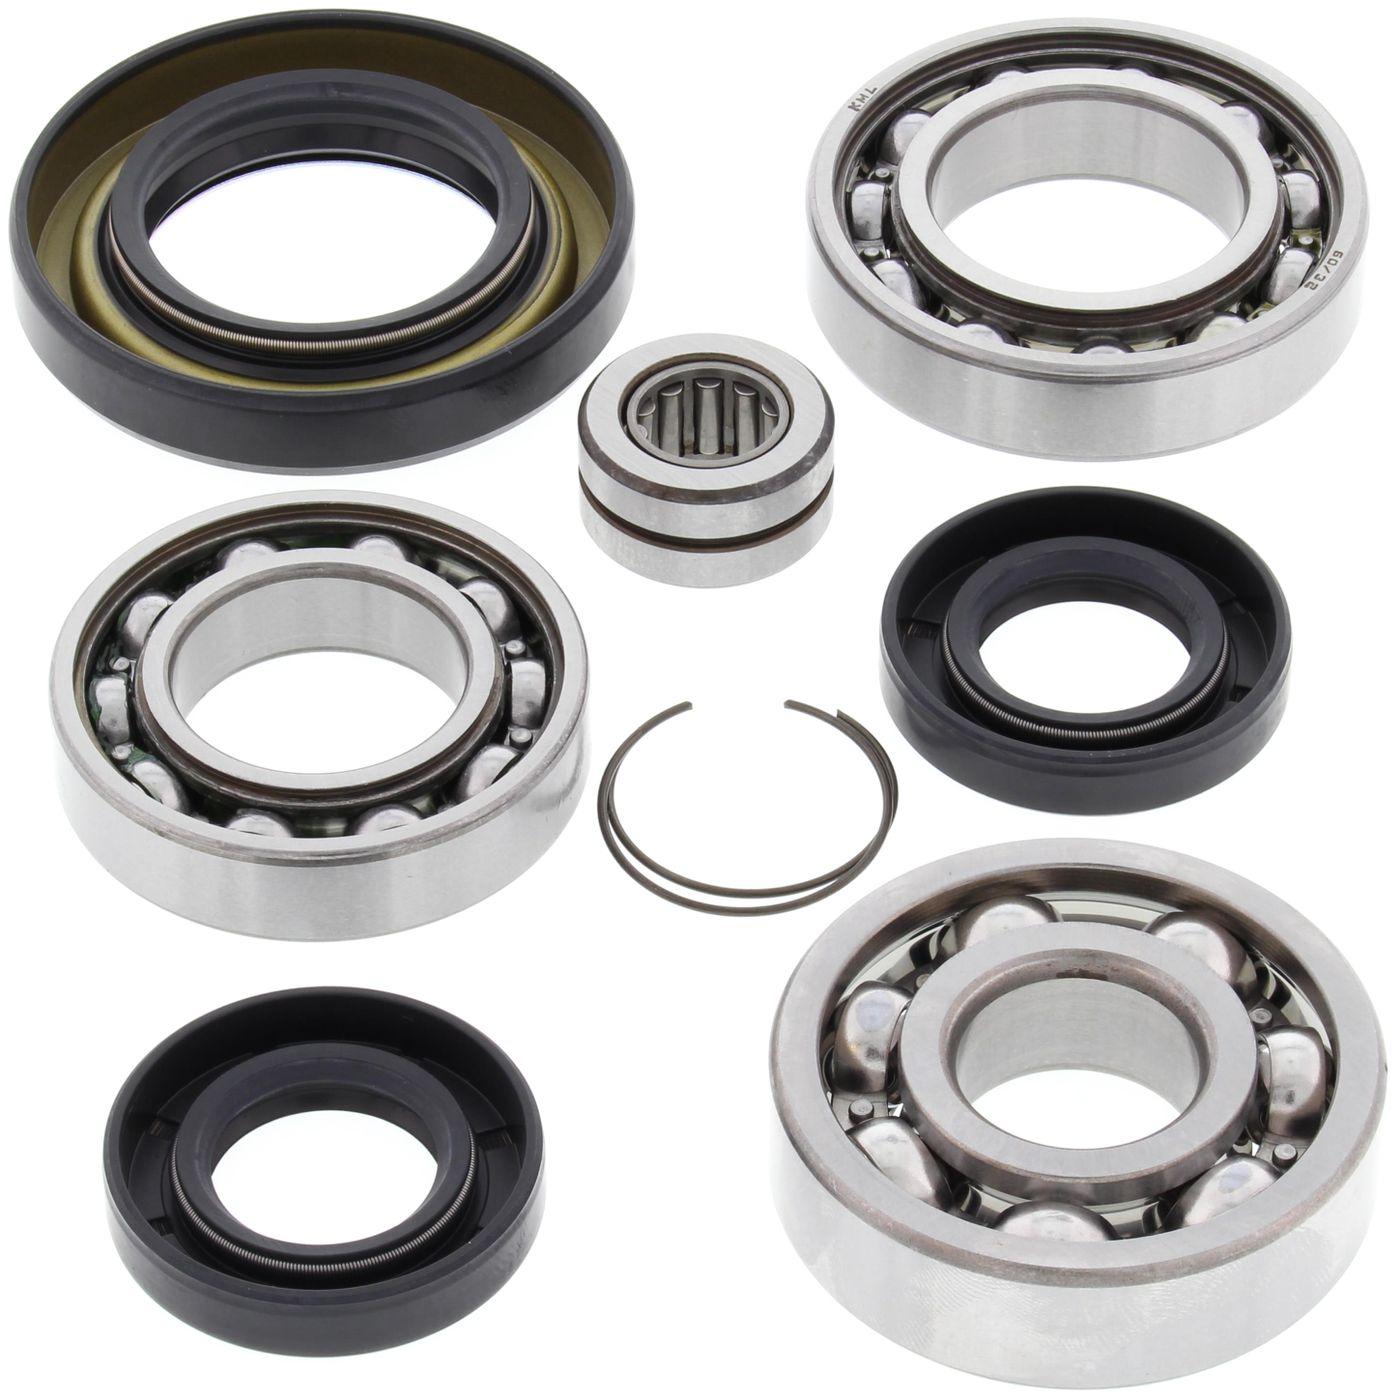 Wrp Diff Bearing & Seal Kits - WRP252002 image